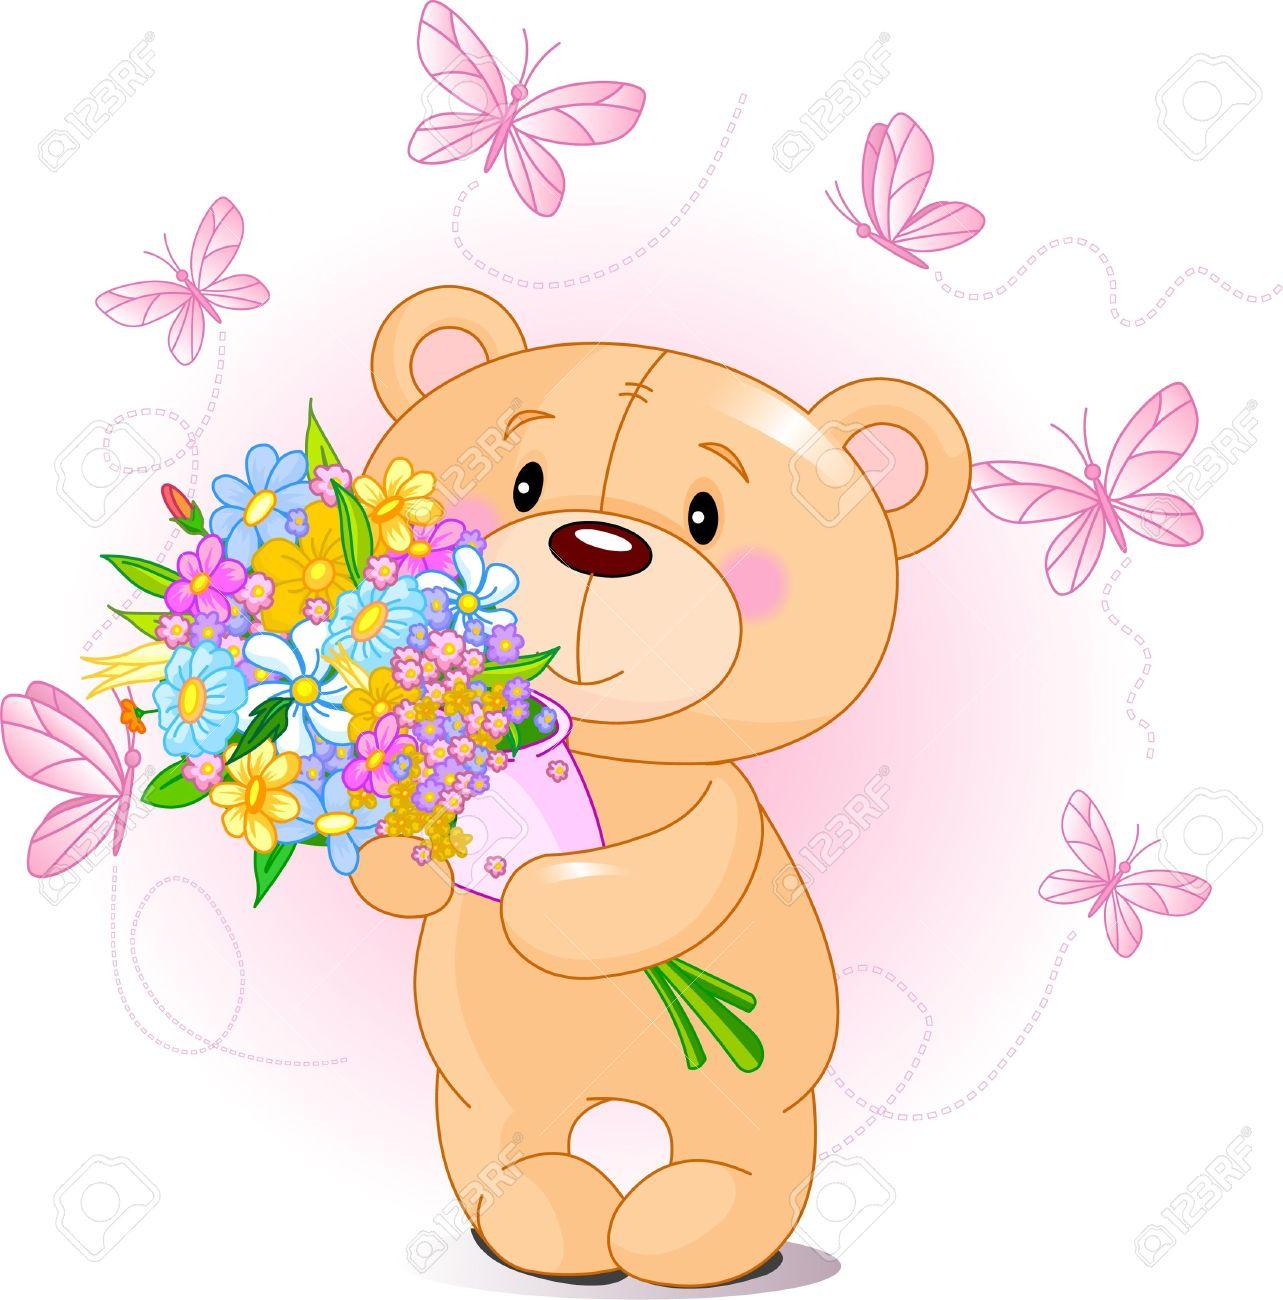 Cute little Teddy bear holding a bouquet Stock Vector - 8723532